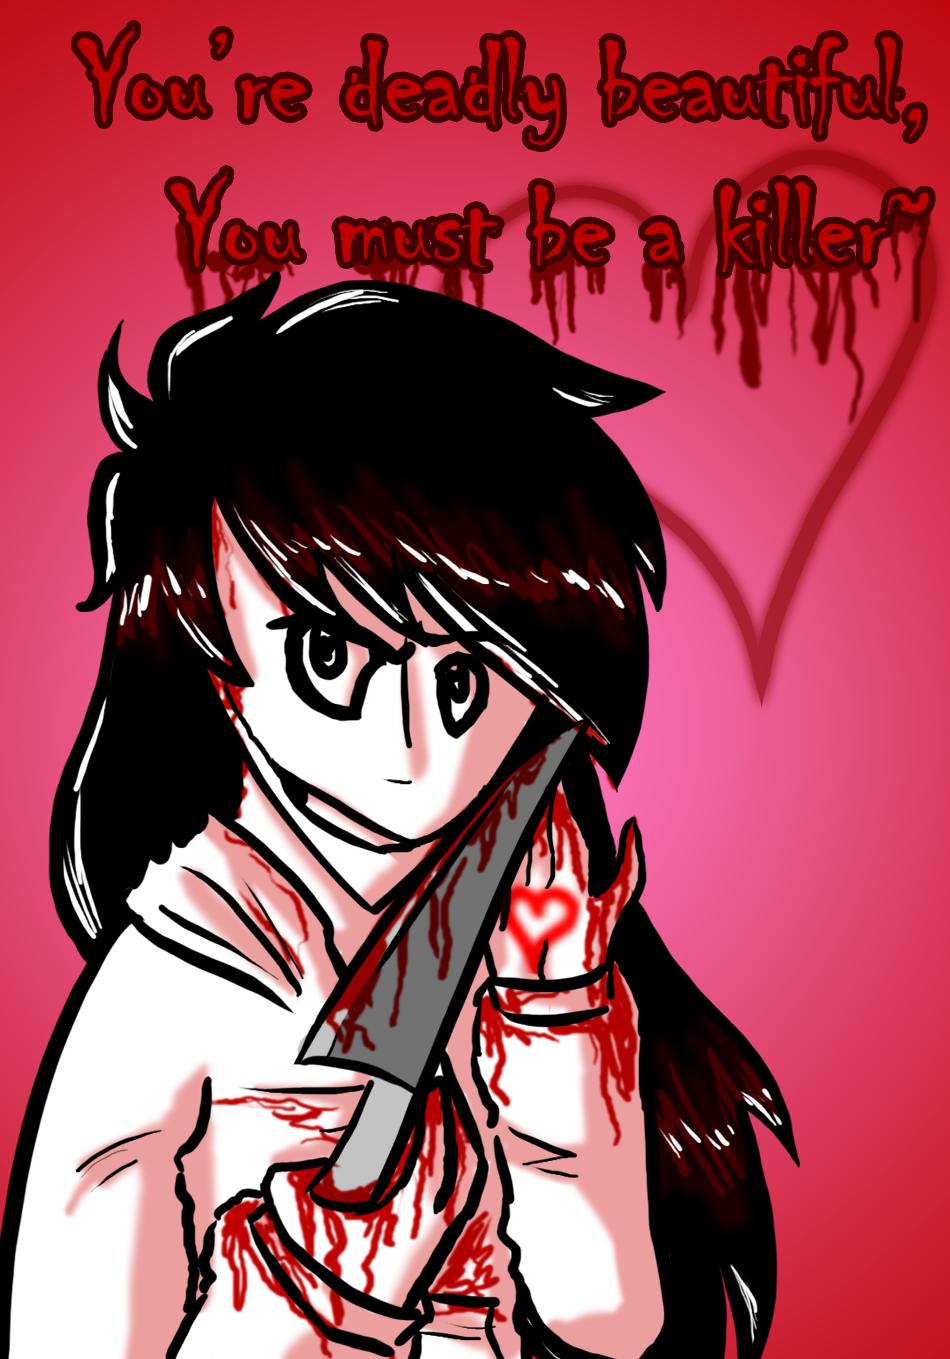 Jeff The Killer Valentine By Origamigirl1223 Jeff The Killer Valentine By  Origamigirl1223